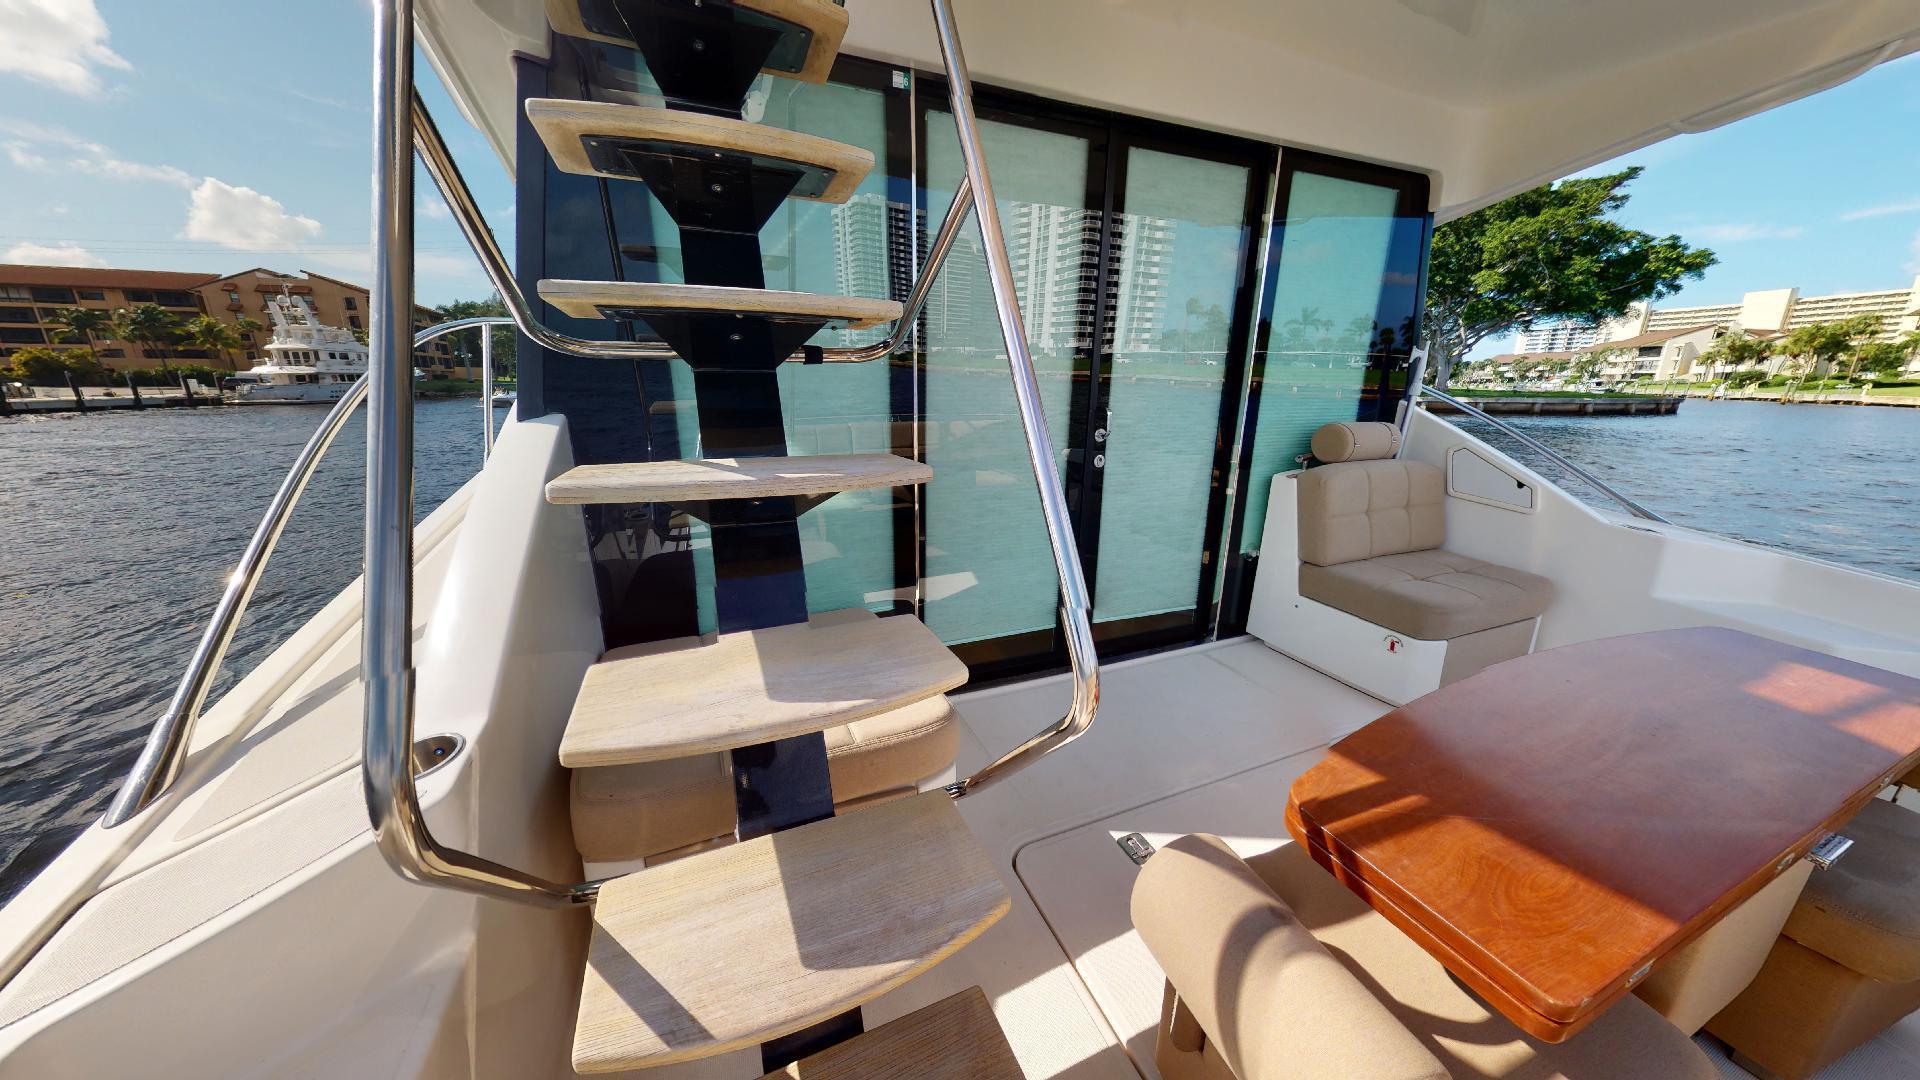 Tiara Yachts-50 Flybridge 2015-Khatch You Later North Palm Beach-Florida-United States-Aft Deck-1509444 | Thumbnail